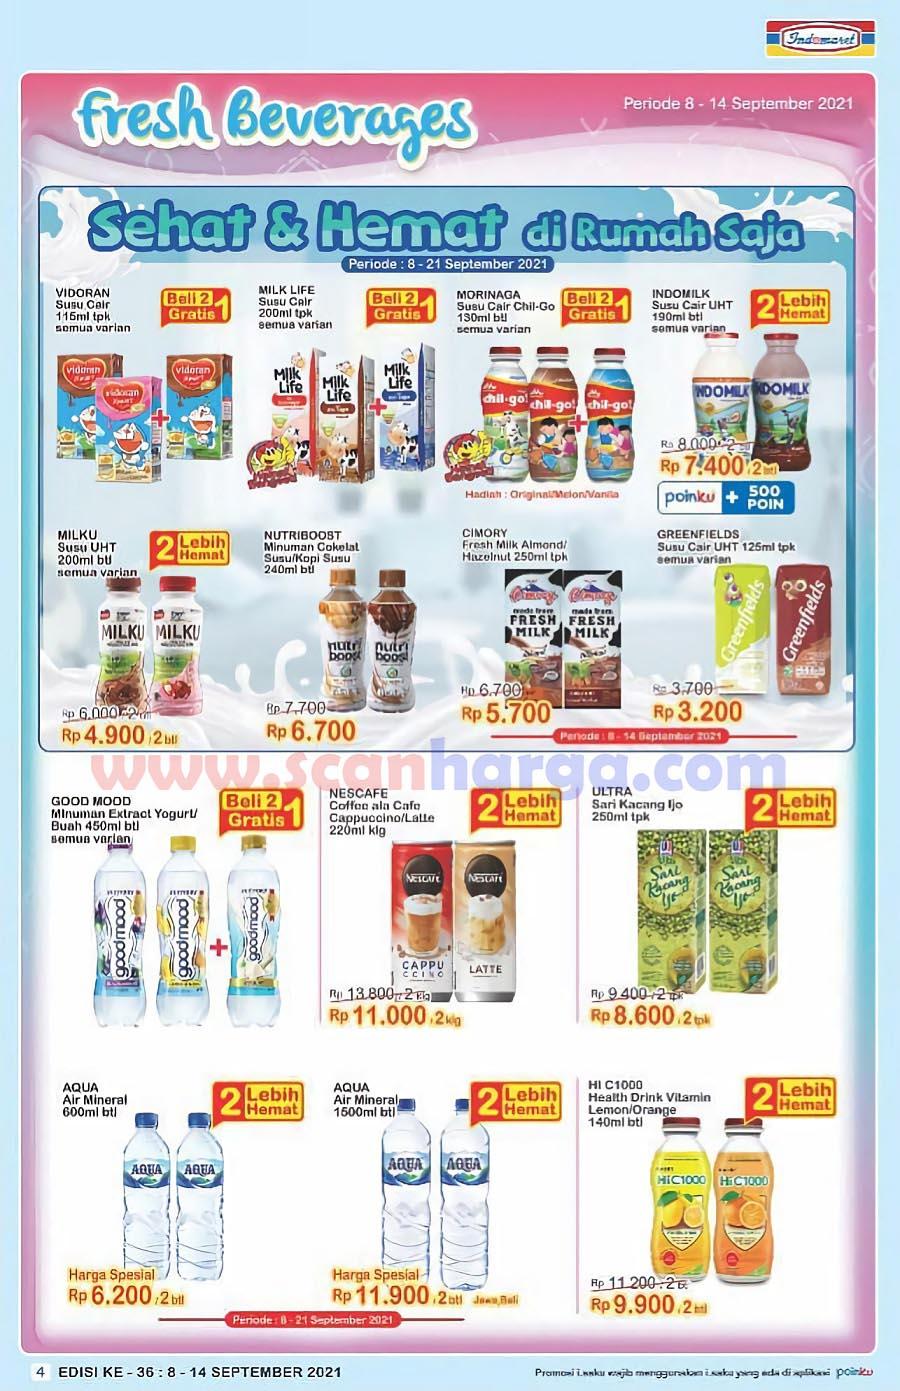 Katalog Indomaret Promo Terbaru 8 - 14 September 2021 4